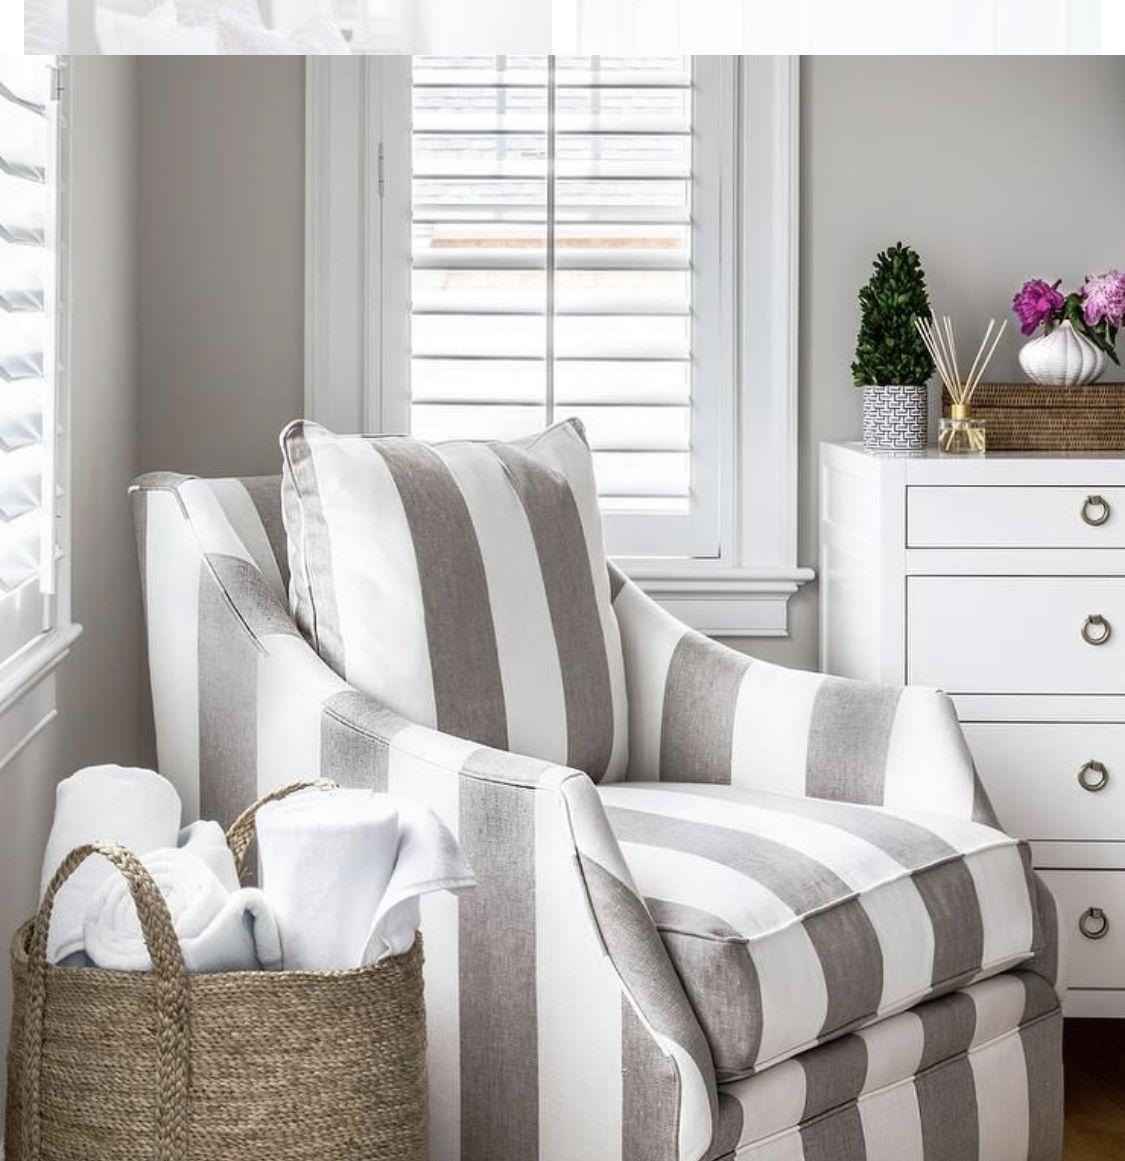 #Home #Decor / 30+ Splendid Accent Chair Ideas For Your ...